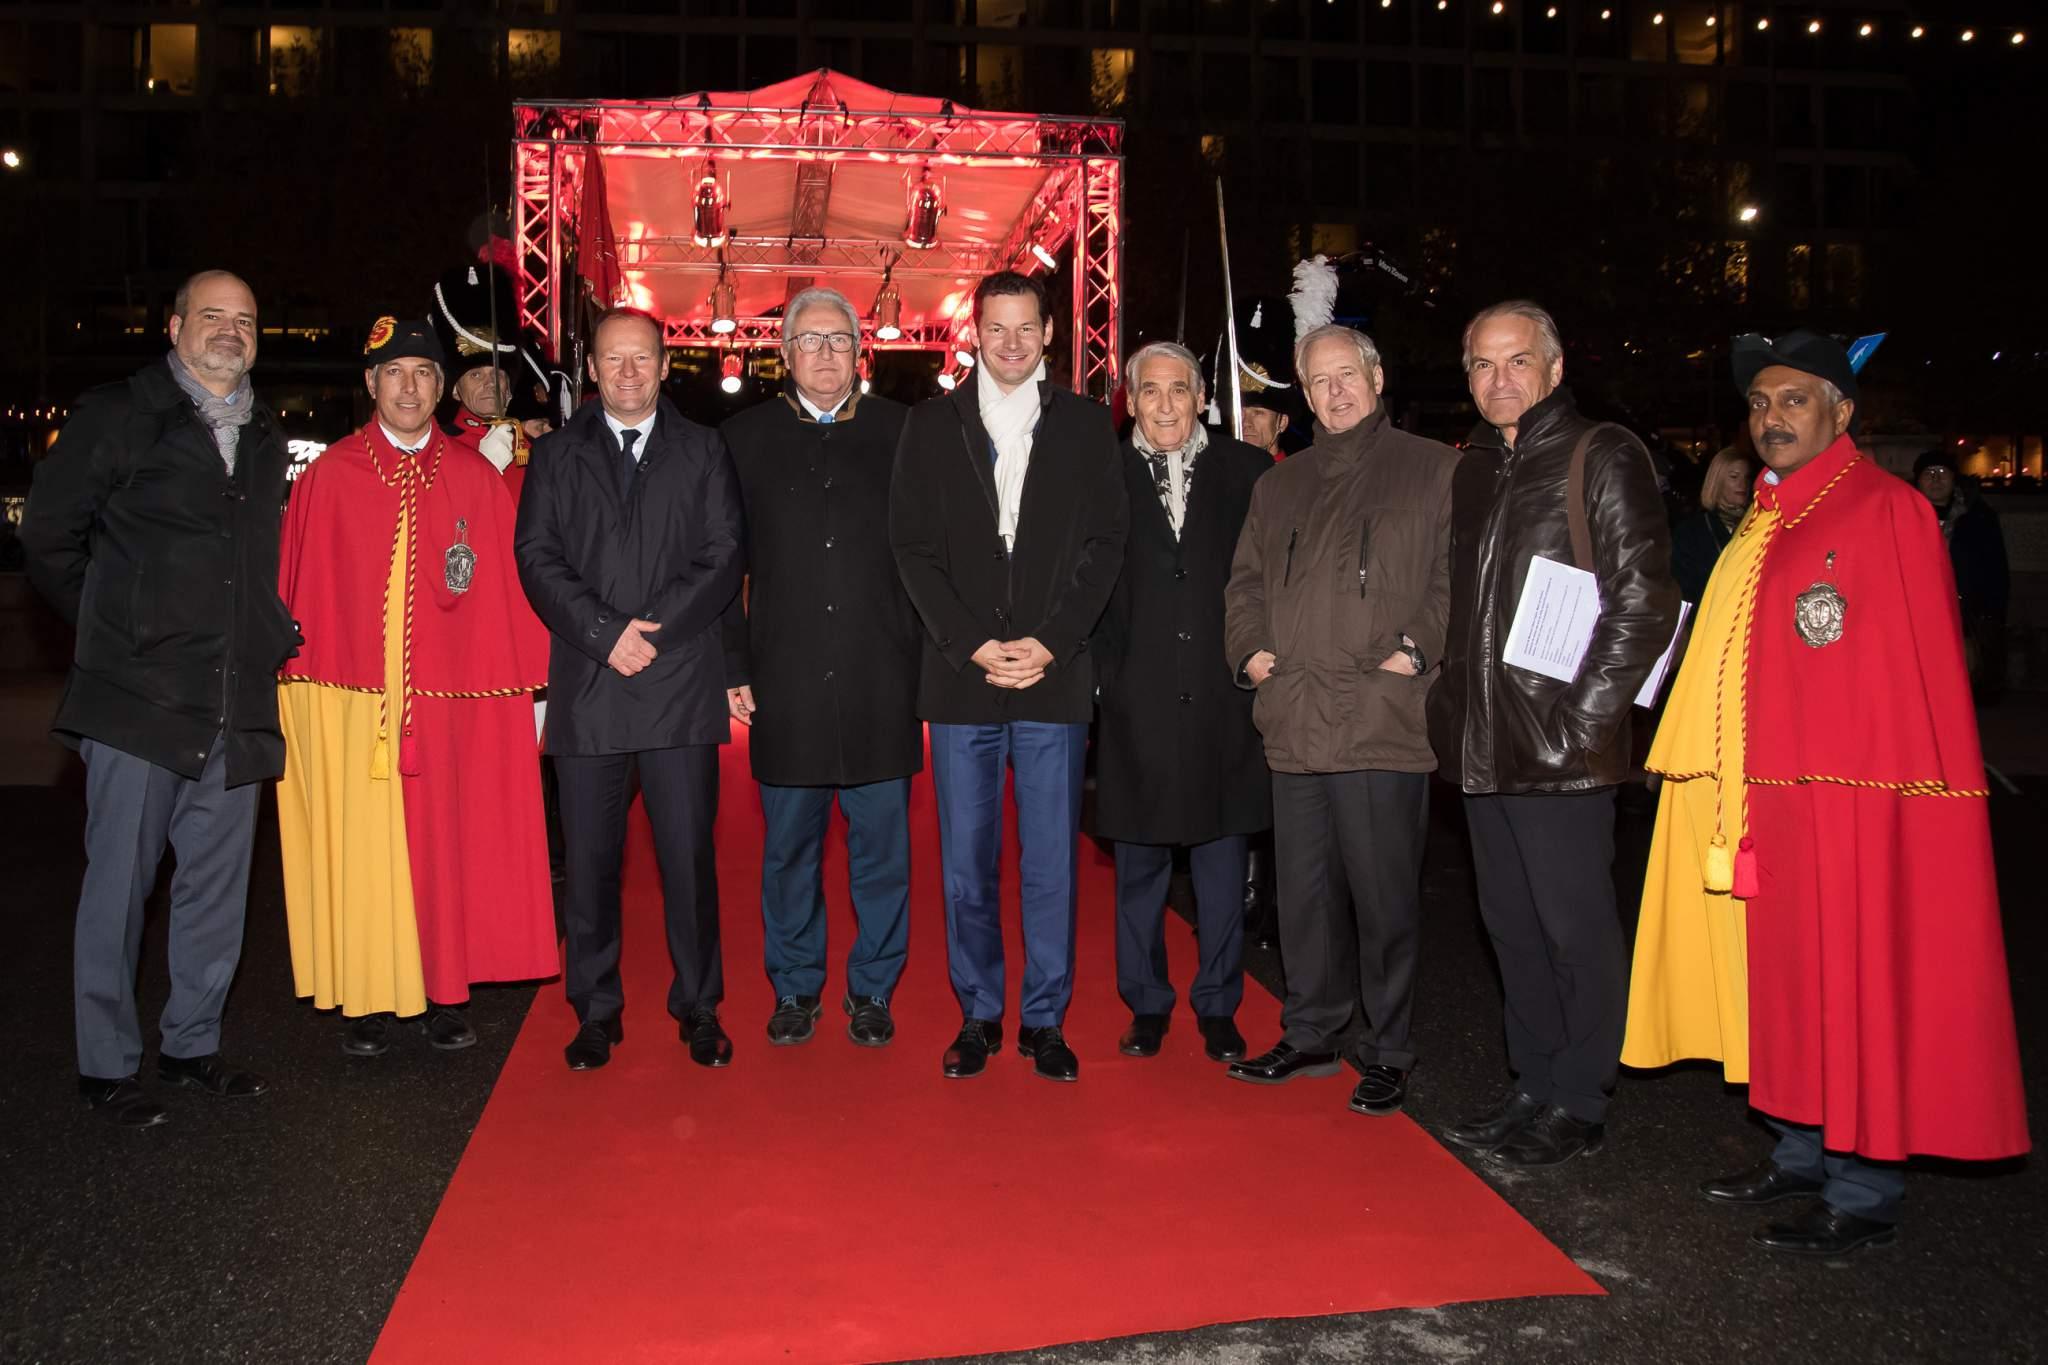 Sami Kanaan (Administrativ Councillor), Serge Dal Busco, Luc Barthassat and Pierre Maudet (State Councillors), Carlo Lamprecht (President of the GPHG Foundation), Prince Philipp von und zu Liechtenstein (Chairman of LGT), Rémy Pagani (Mayor of the City of Geneva)